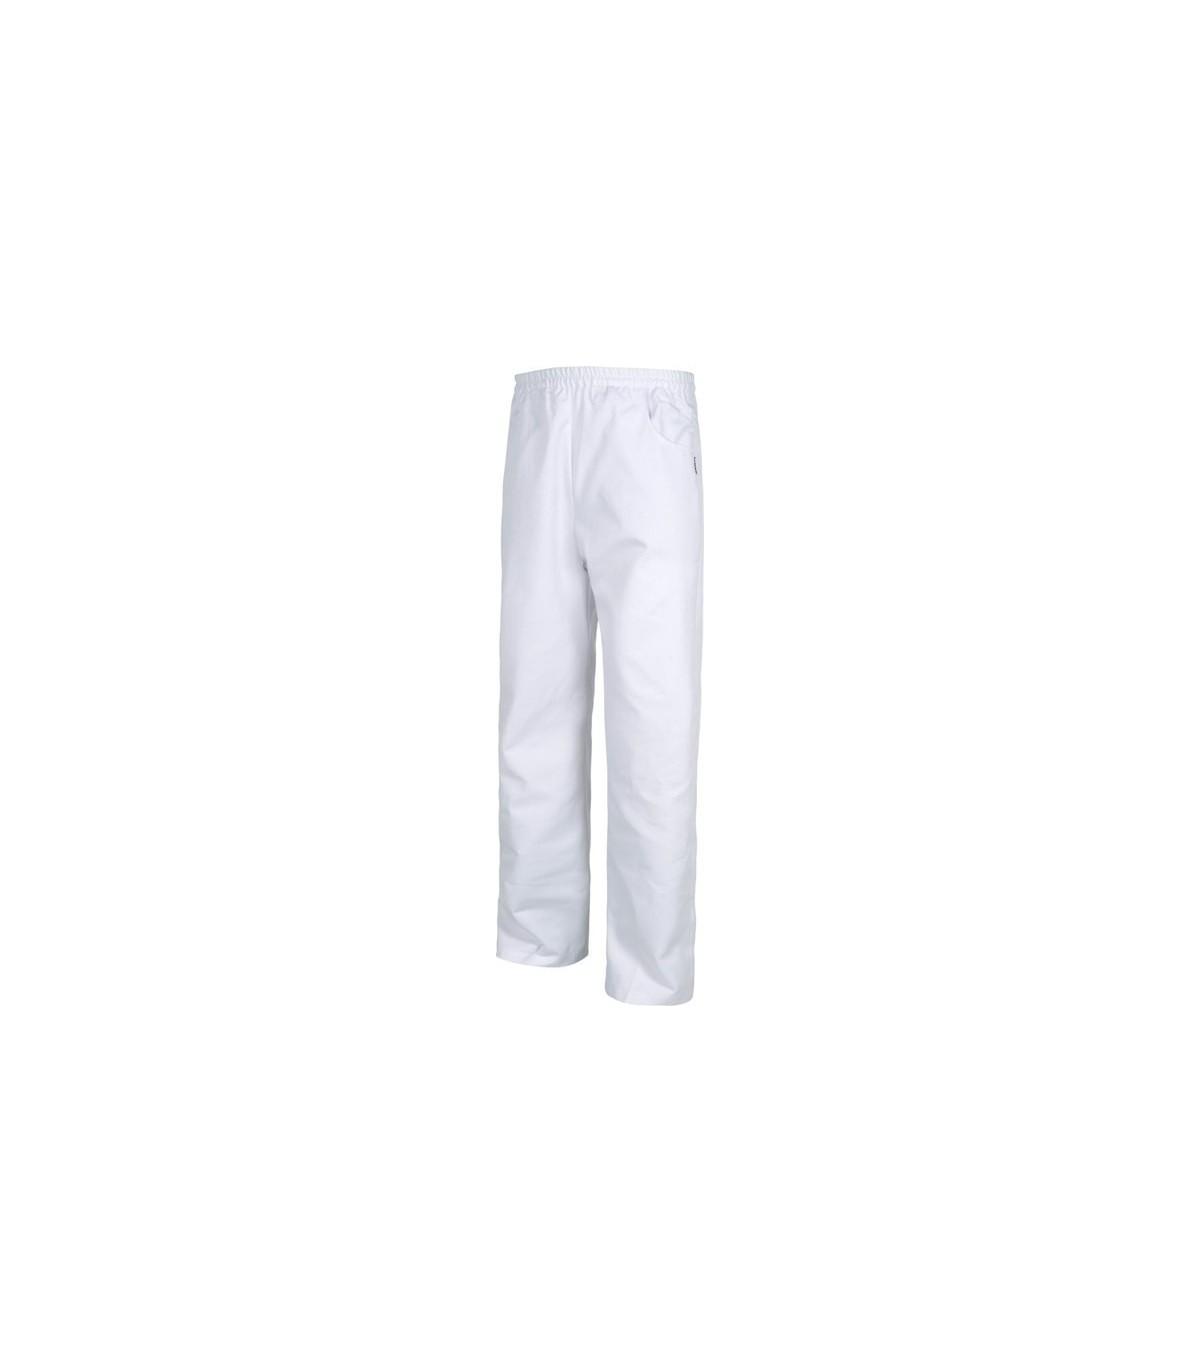 Pantalon De Trabajo Recto Para Uniforme De Cocina